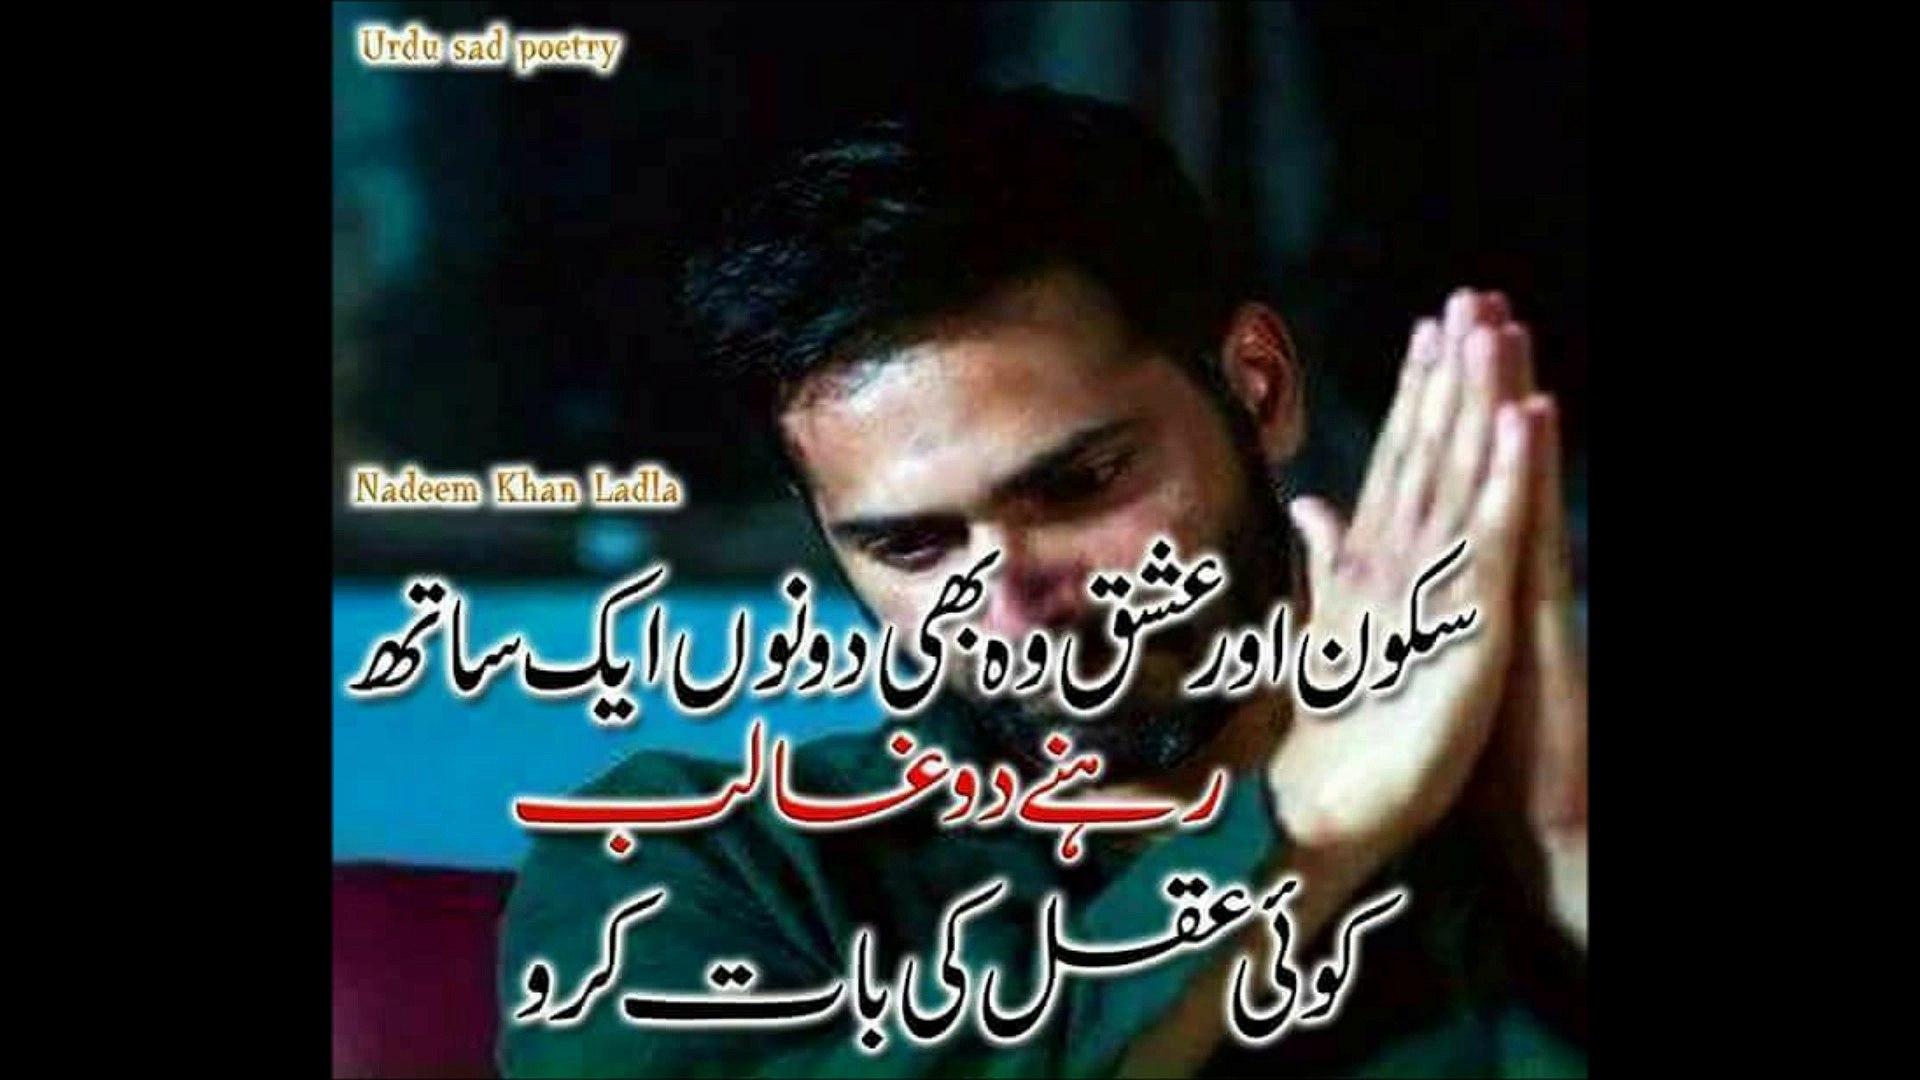 Sher o shayari urdu images